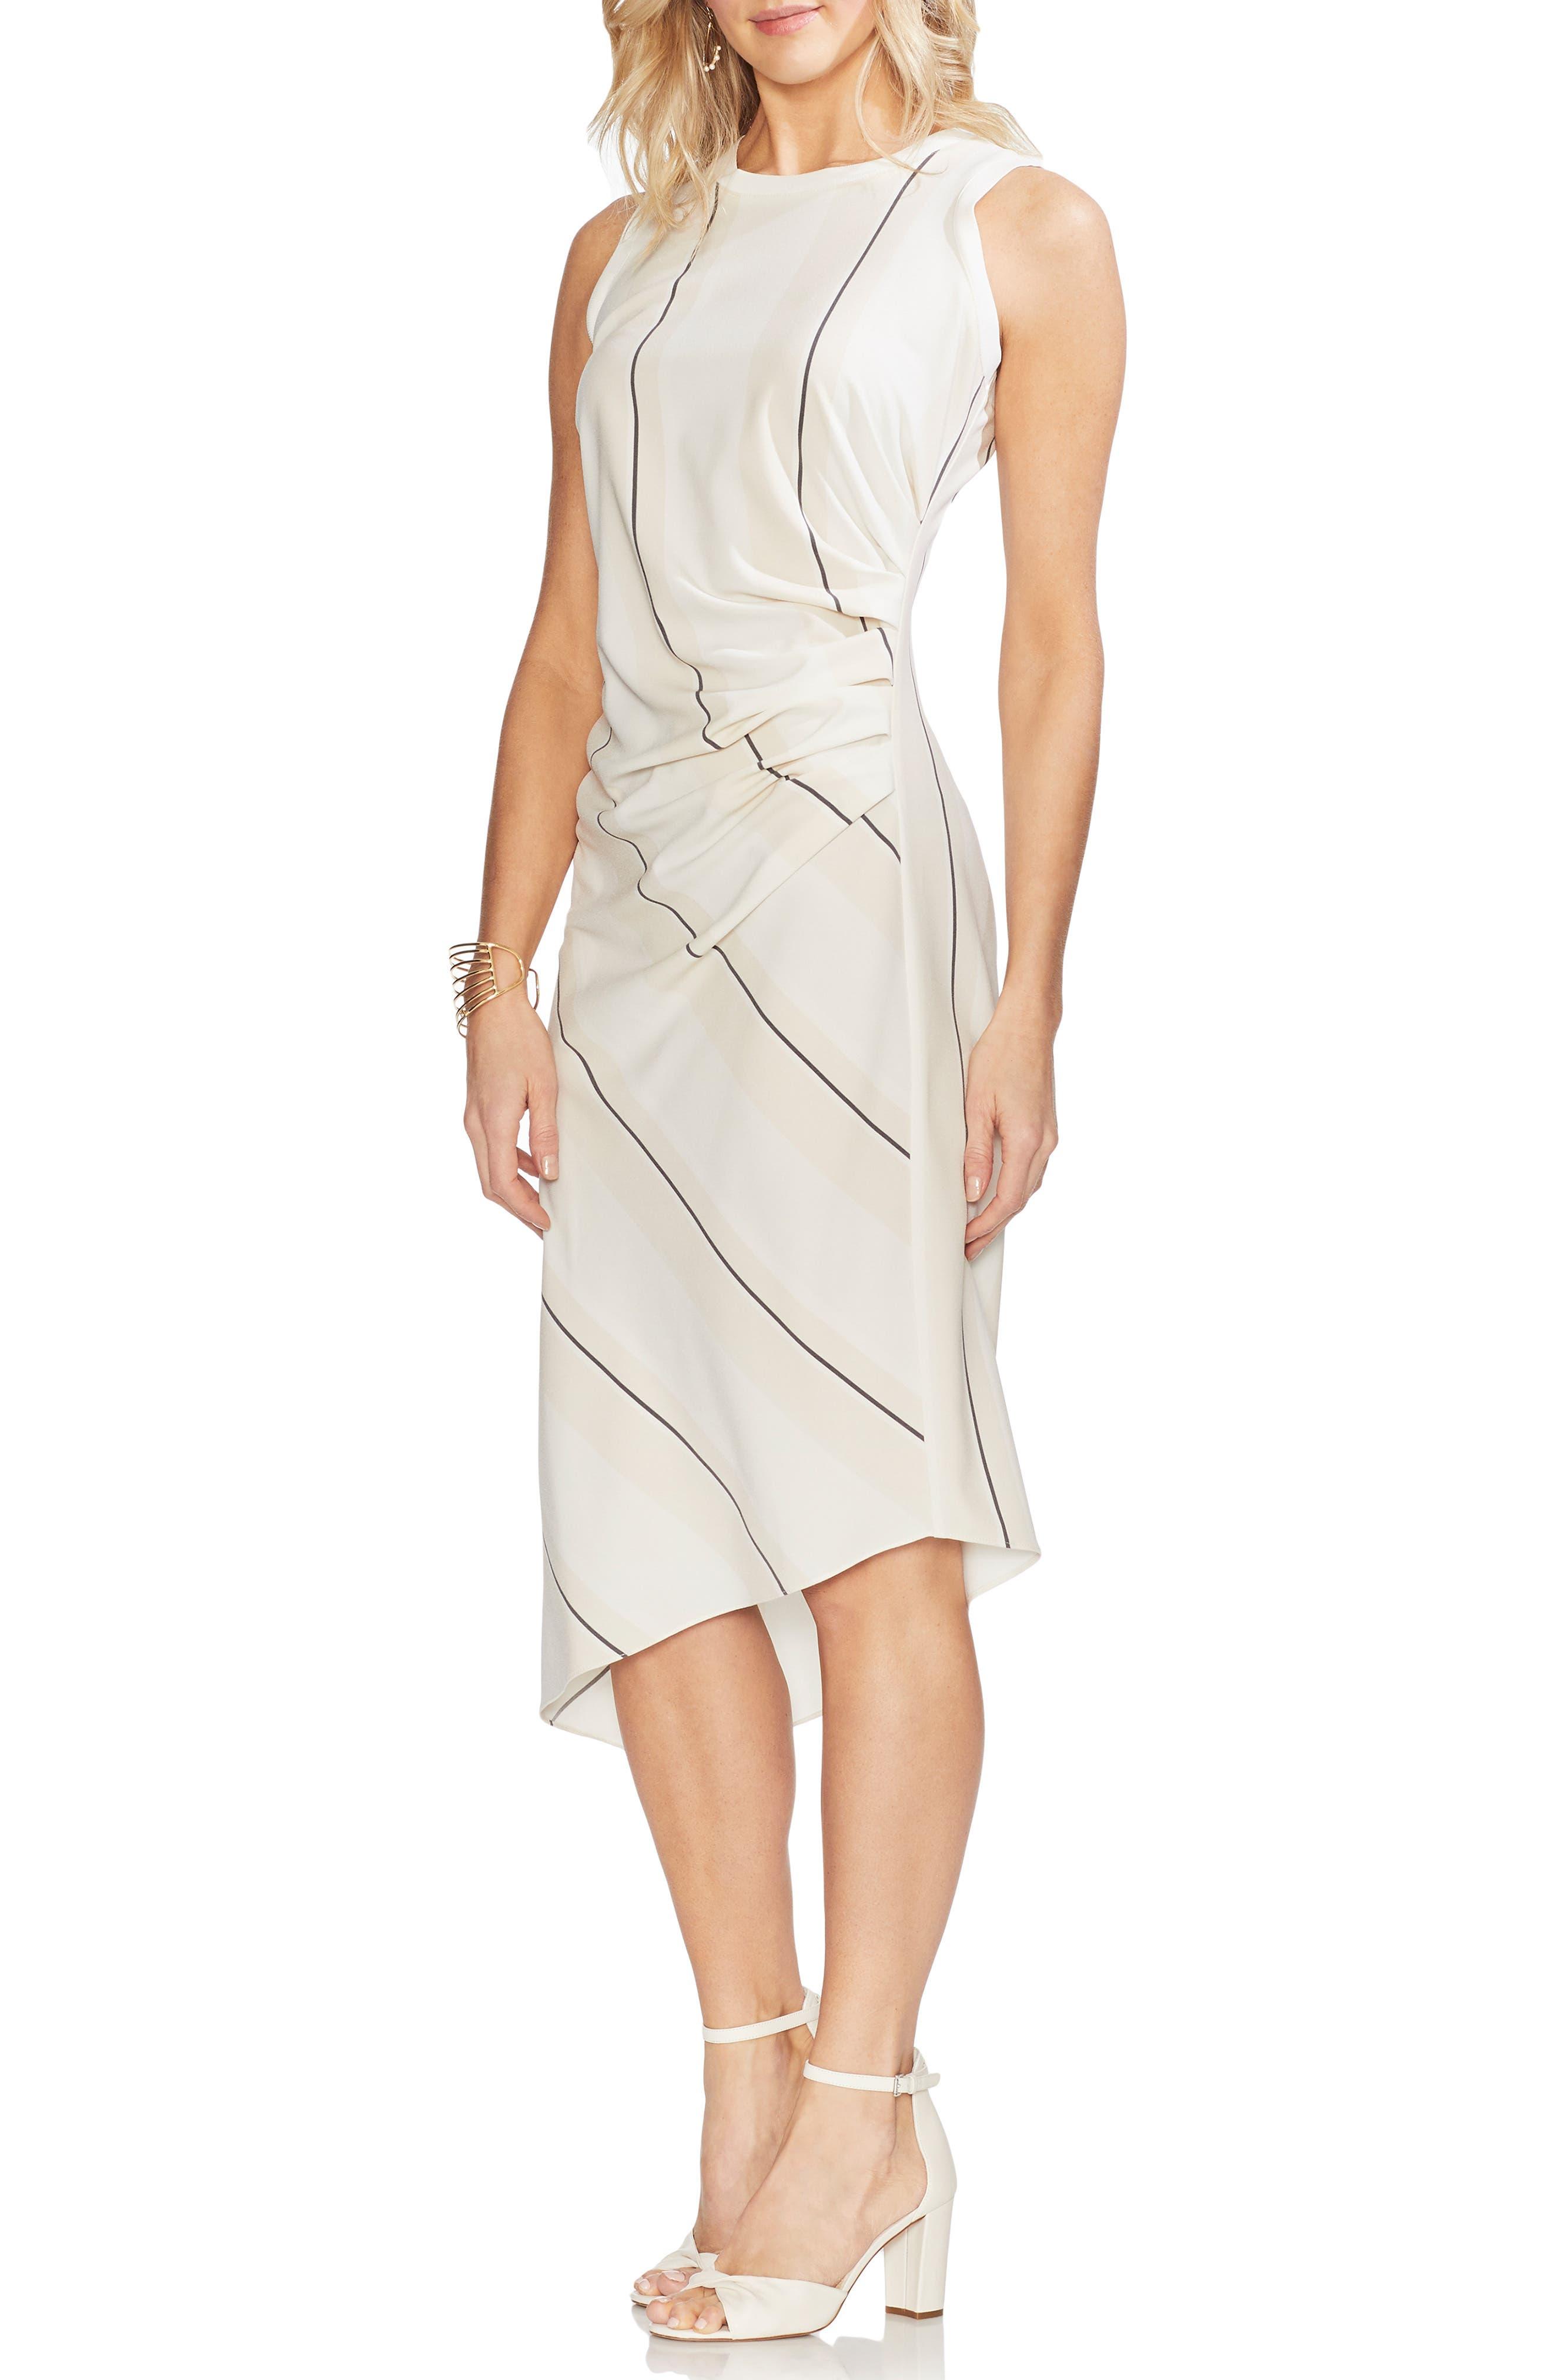 Vince Camuto Desertscape Stripe Asymmetrical Body-Con Dress, Ivory